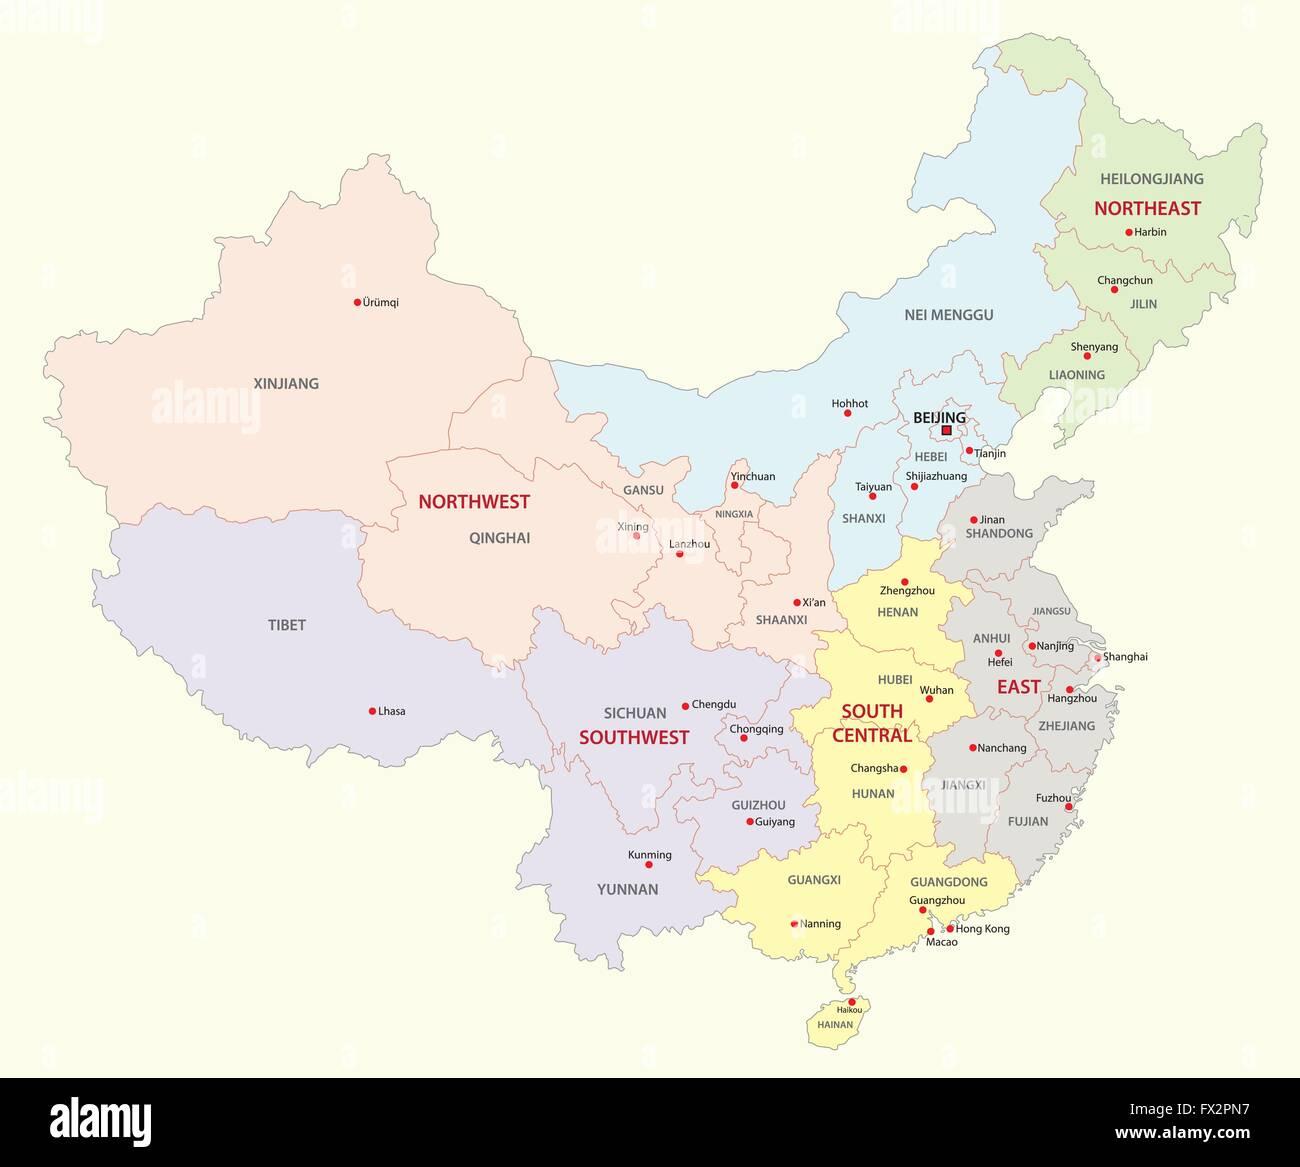 china regions map - Stock Image